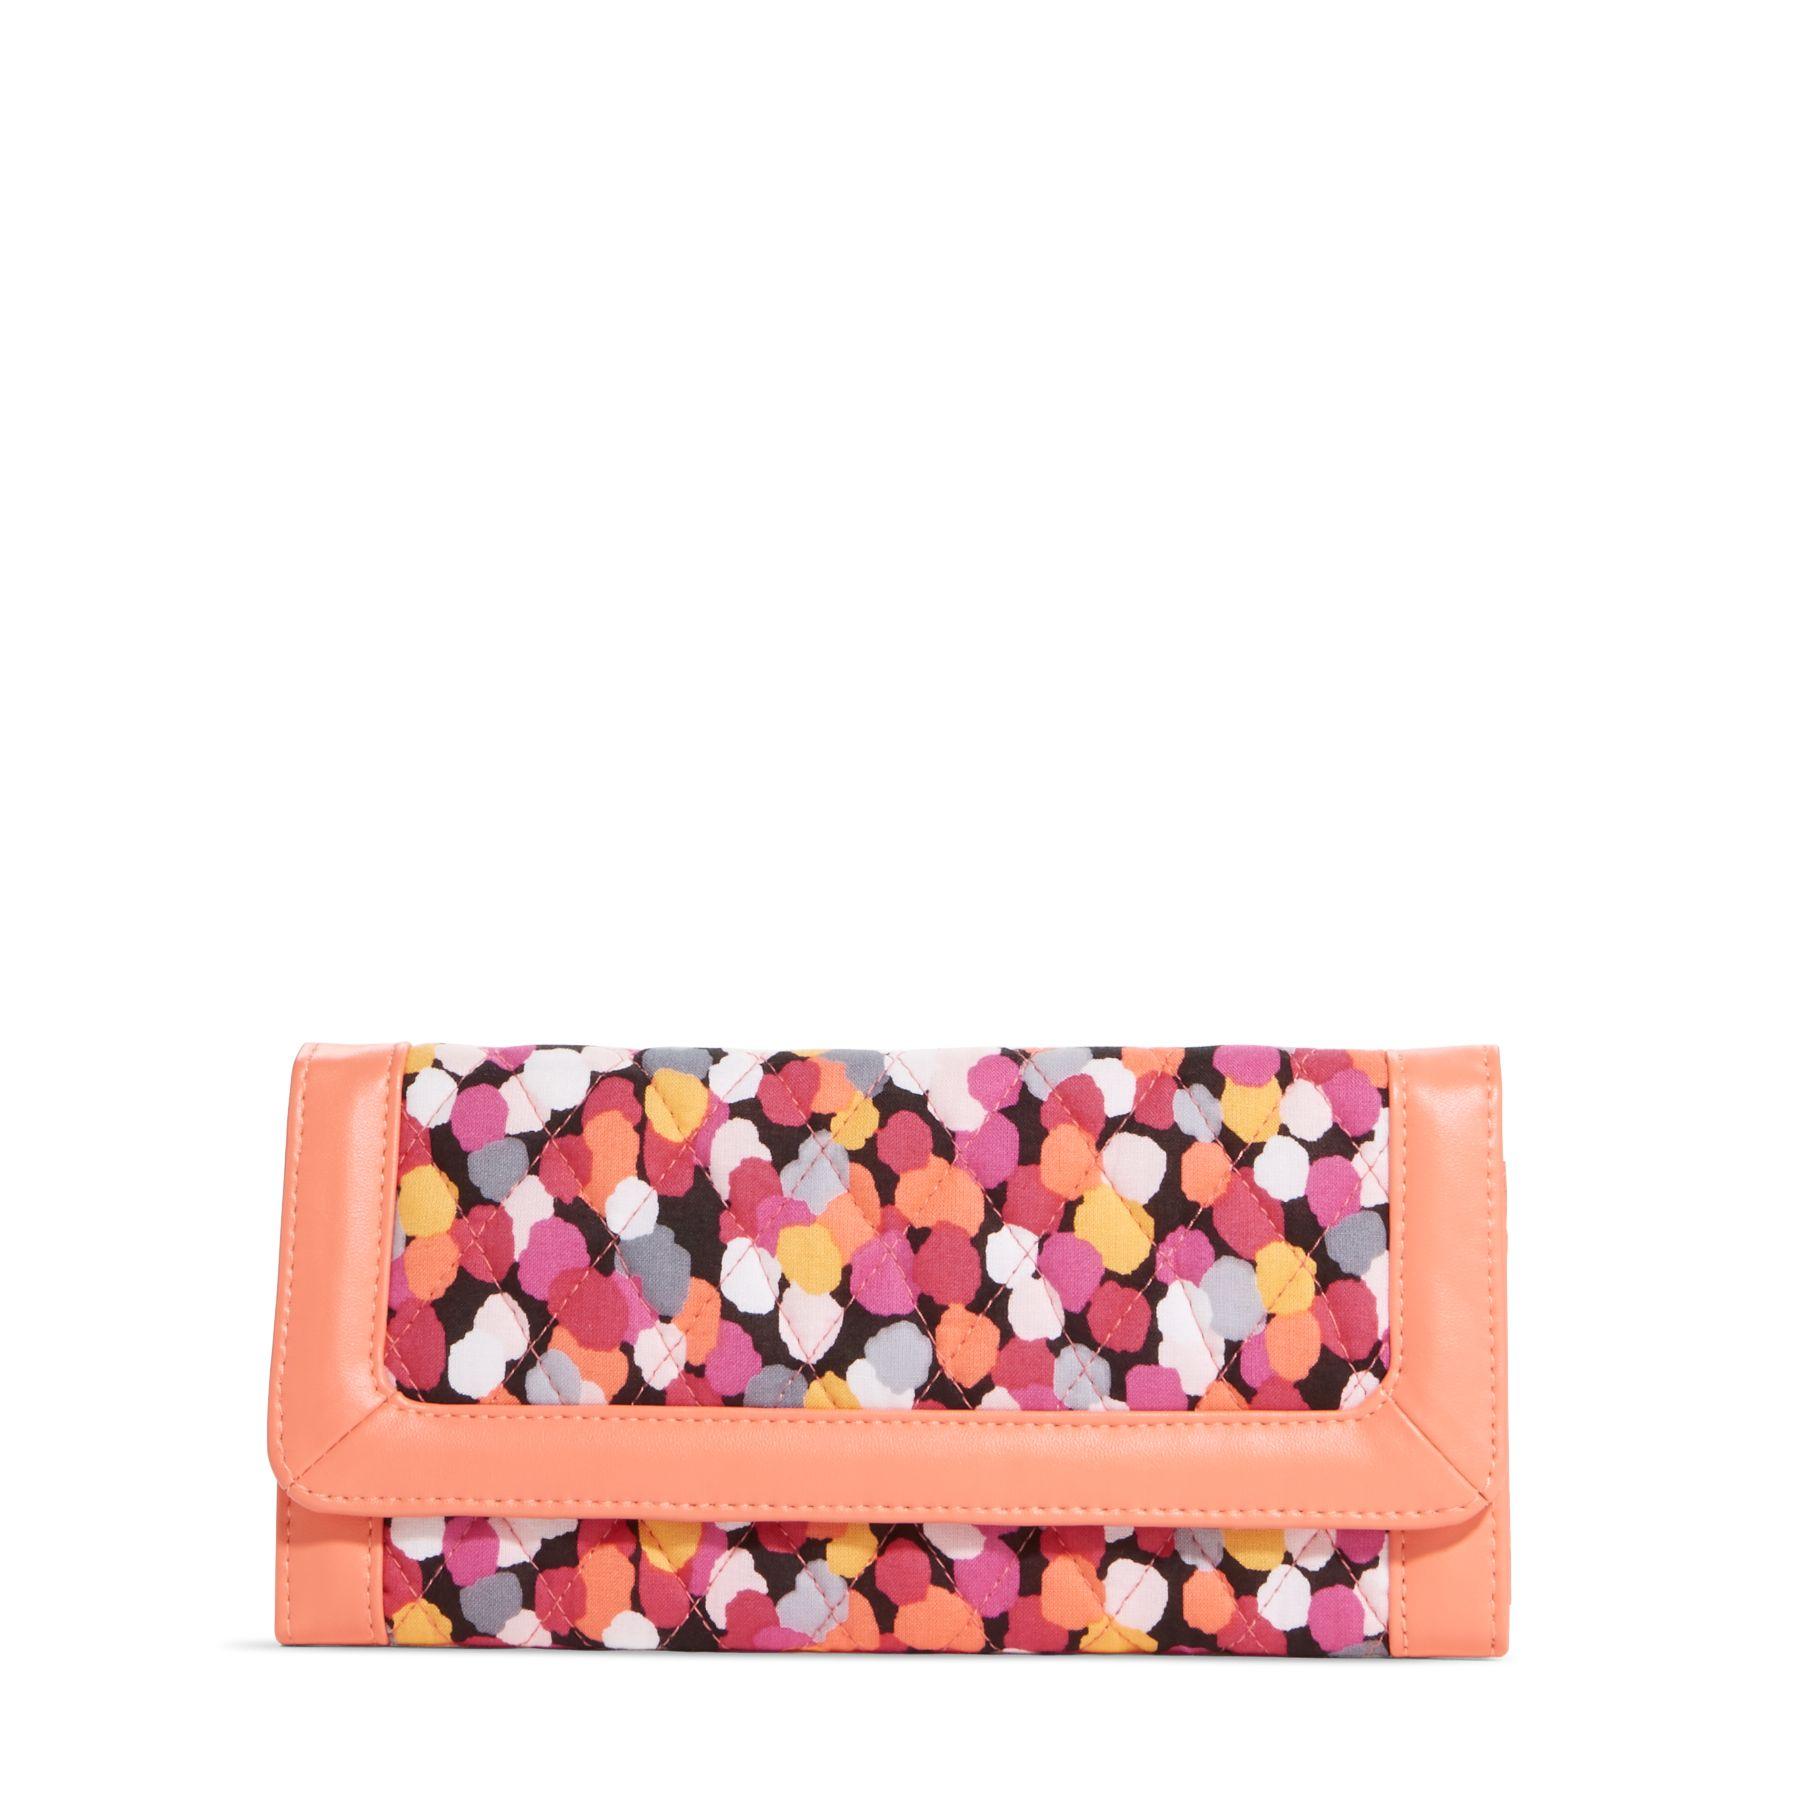 Vera Bradley Trifold Wallet in Pixie Confetti 14772-208944 Clutch | eBay